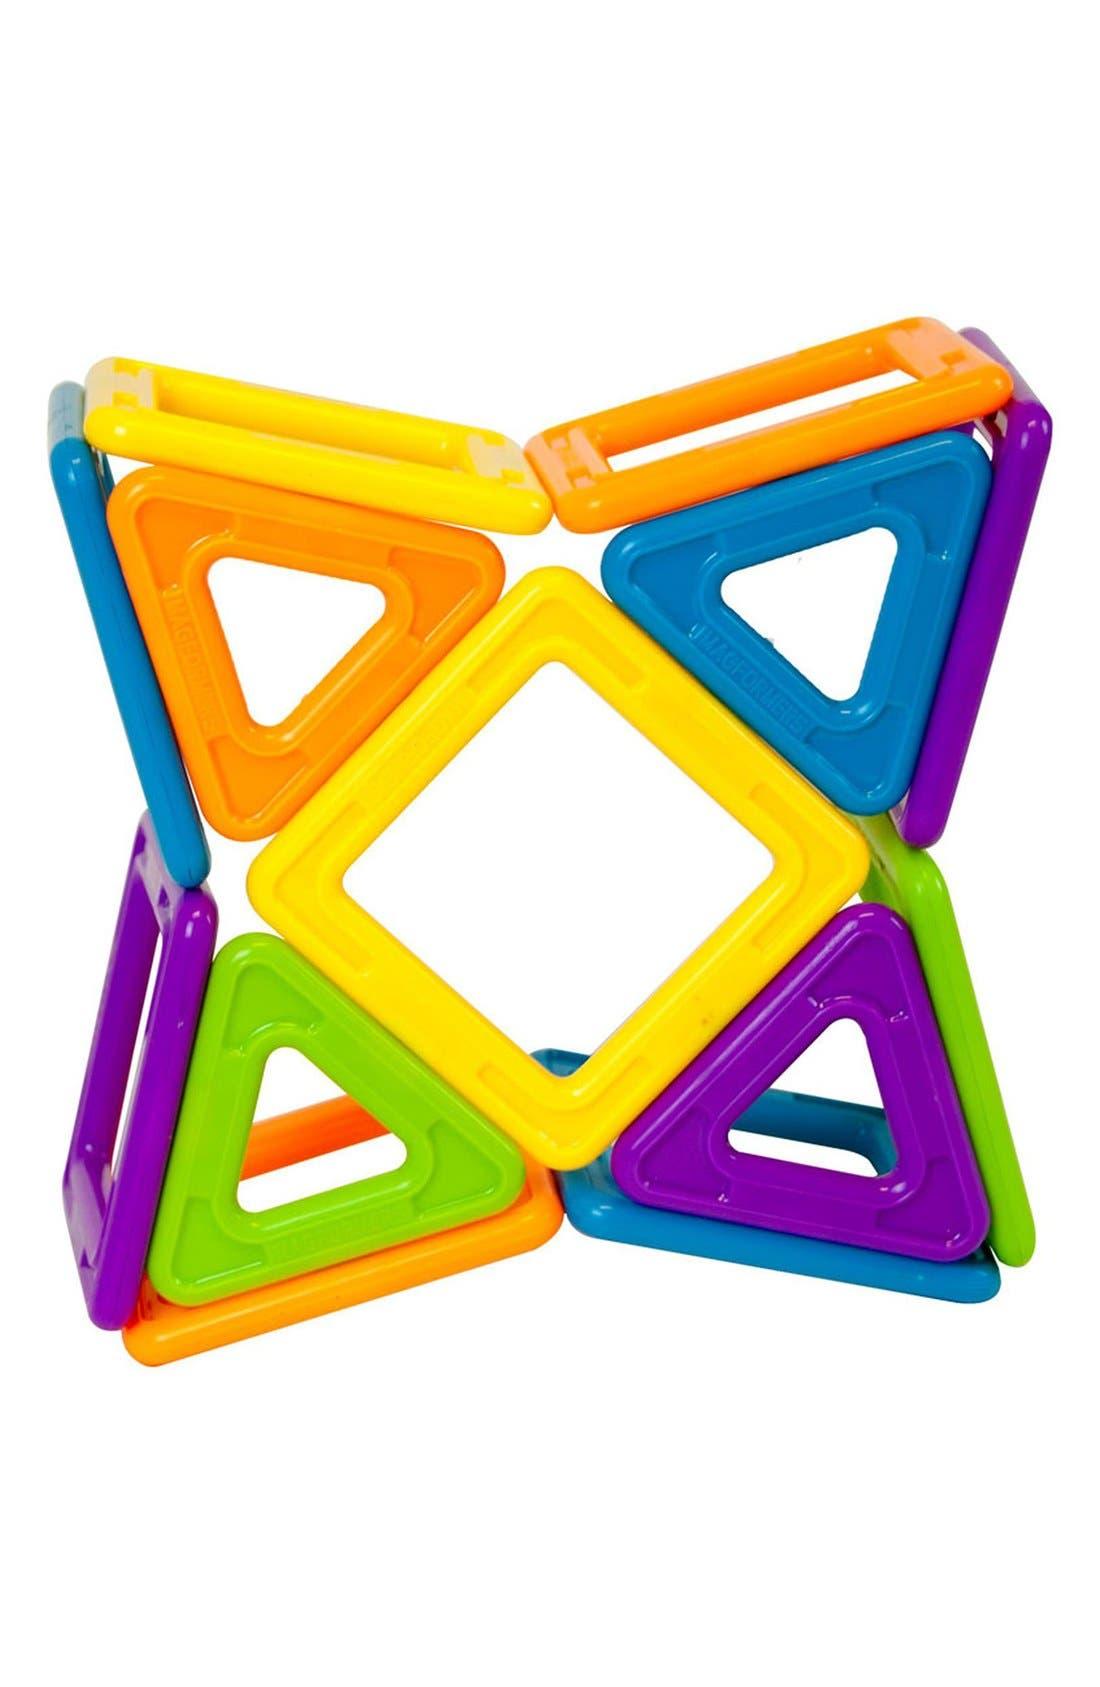 'Vehicle - WOW' Magnetic 3D Construction Set,                             Alternate thumbnail 3, color,                             Opaque Rainbow